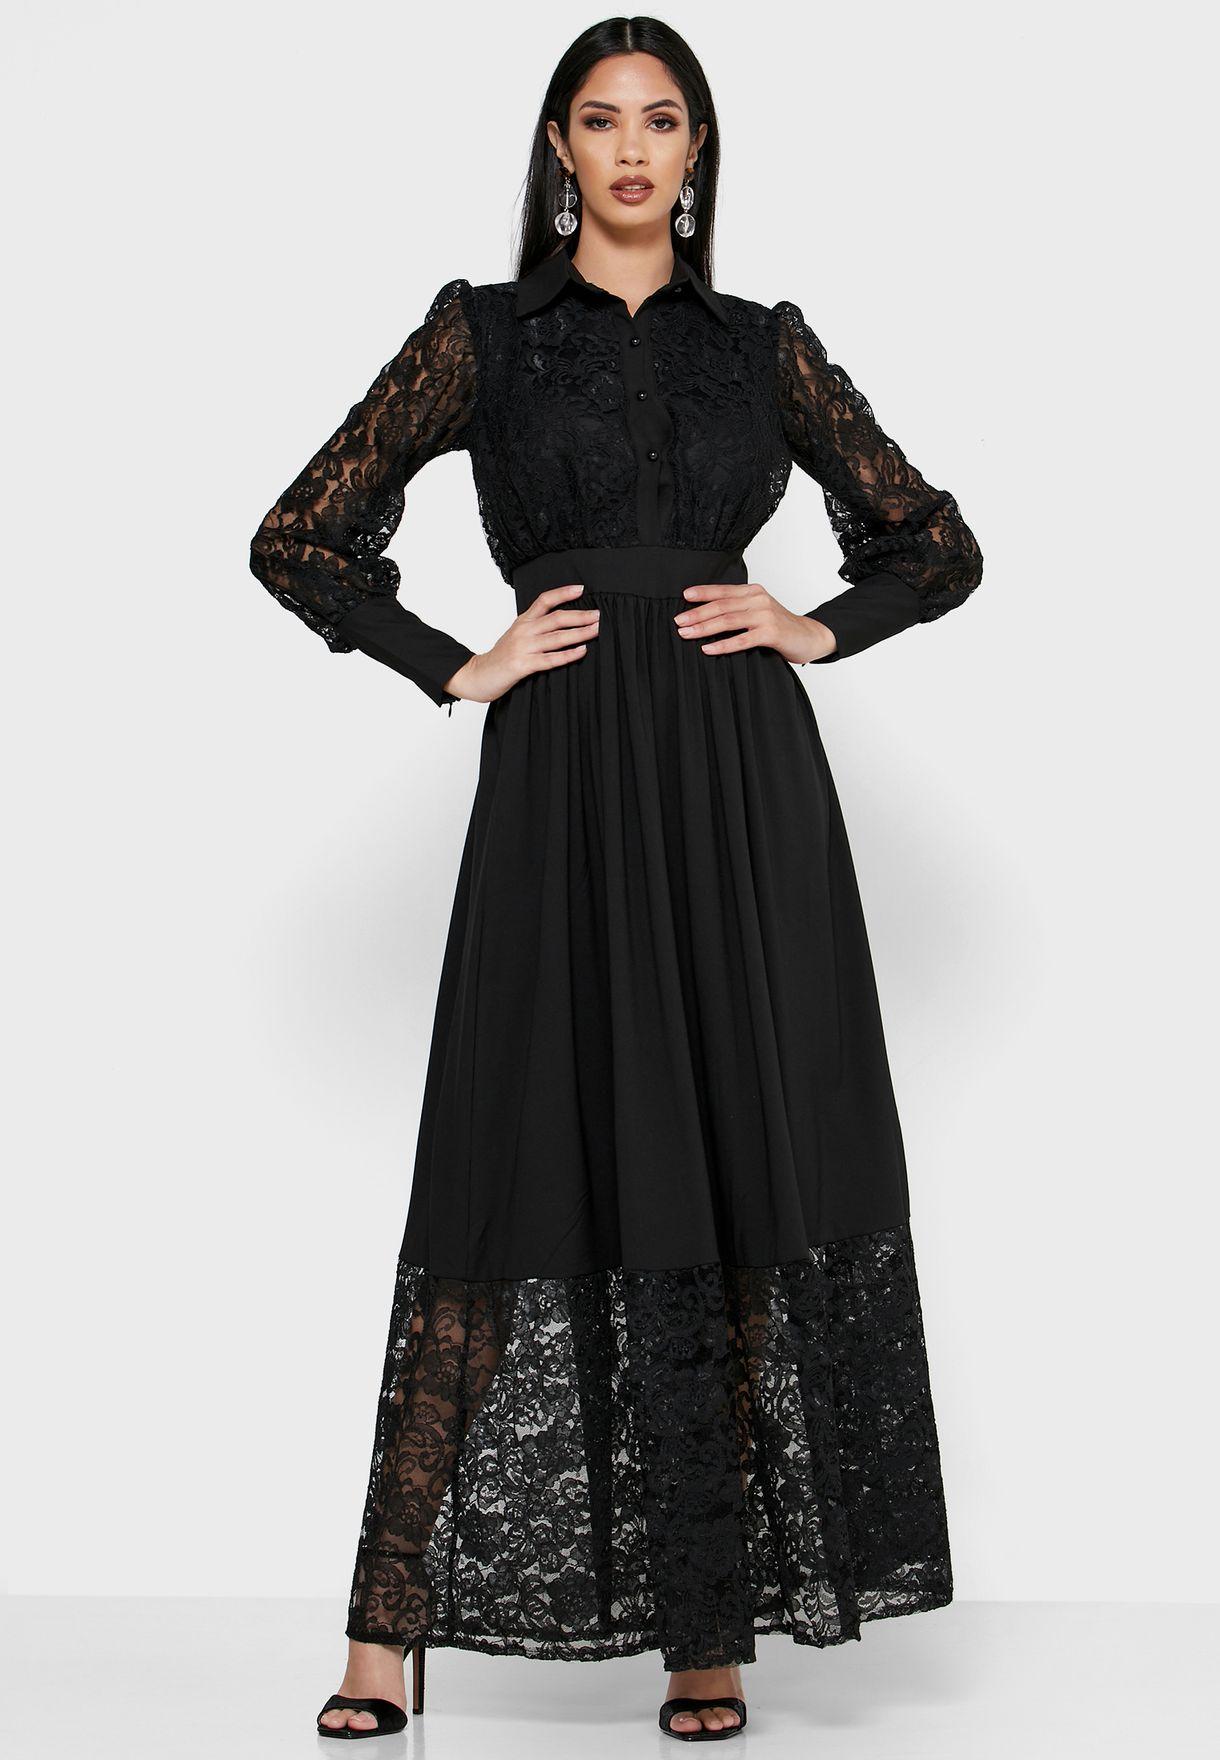 فستان مكسي بأجزاء دانتيل